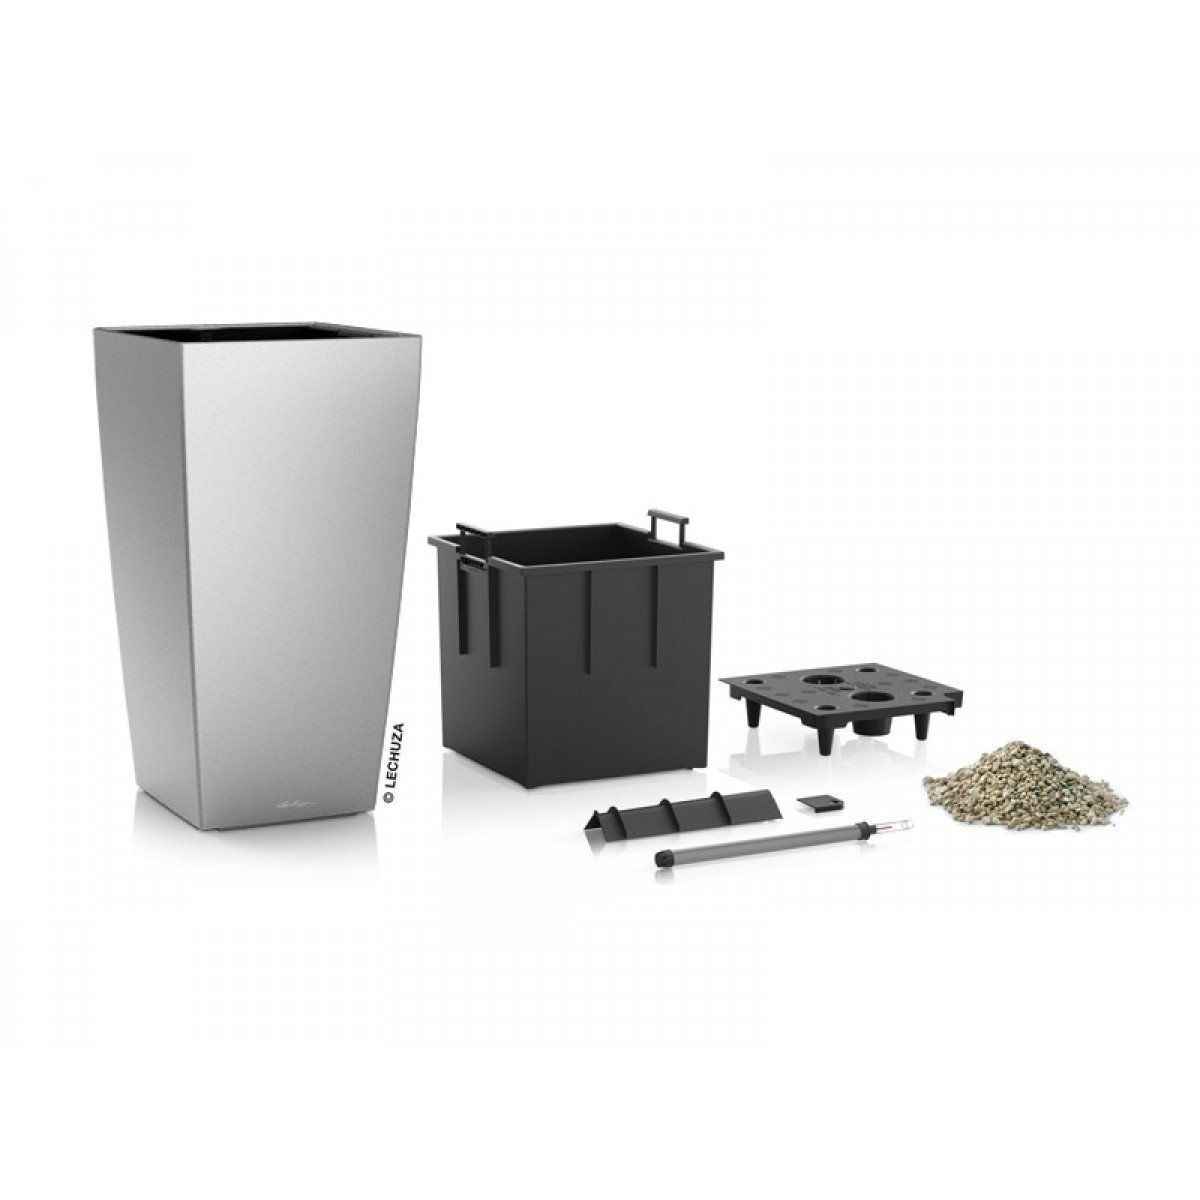 Lechuza EP-LCUB-SIL-20 20 x 20 x 37 in. Cubico Premium Planter44; Silver Metallic